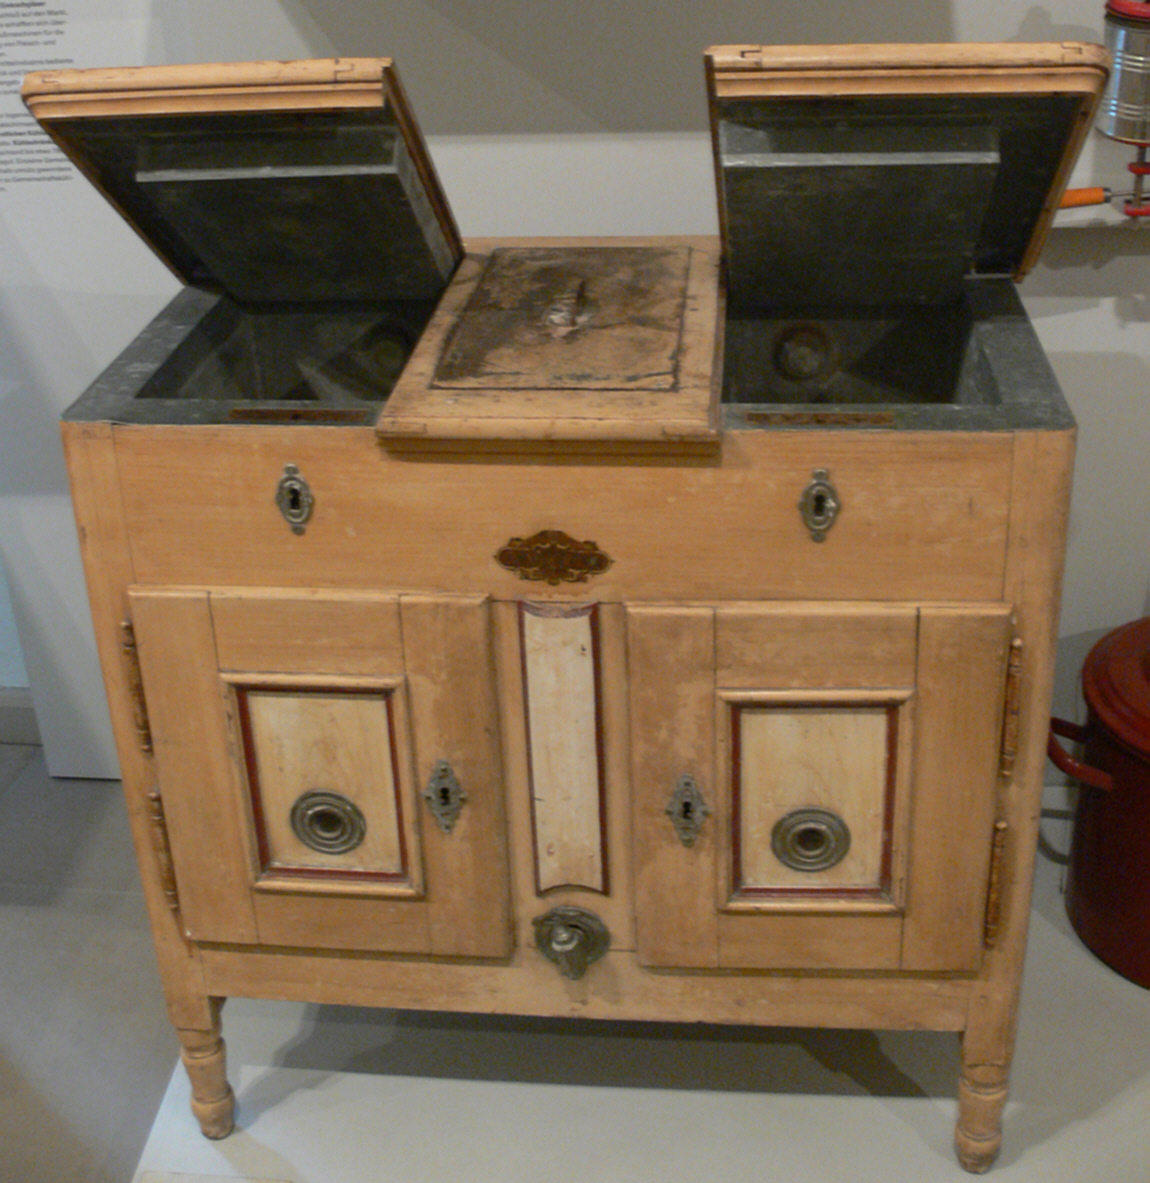 eisschrank wikipedia. Black Bedroom Furniture Sets. Home Design Ideas